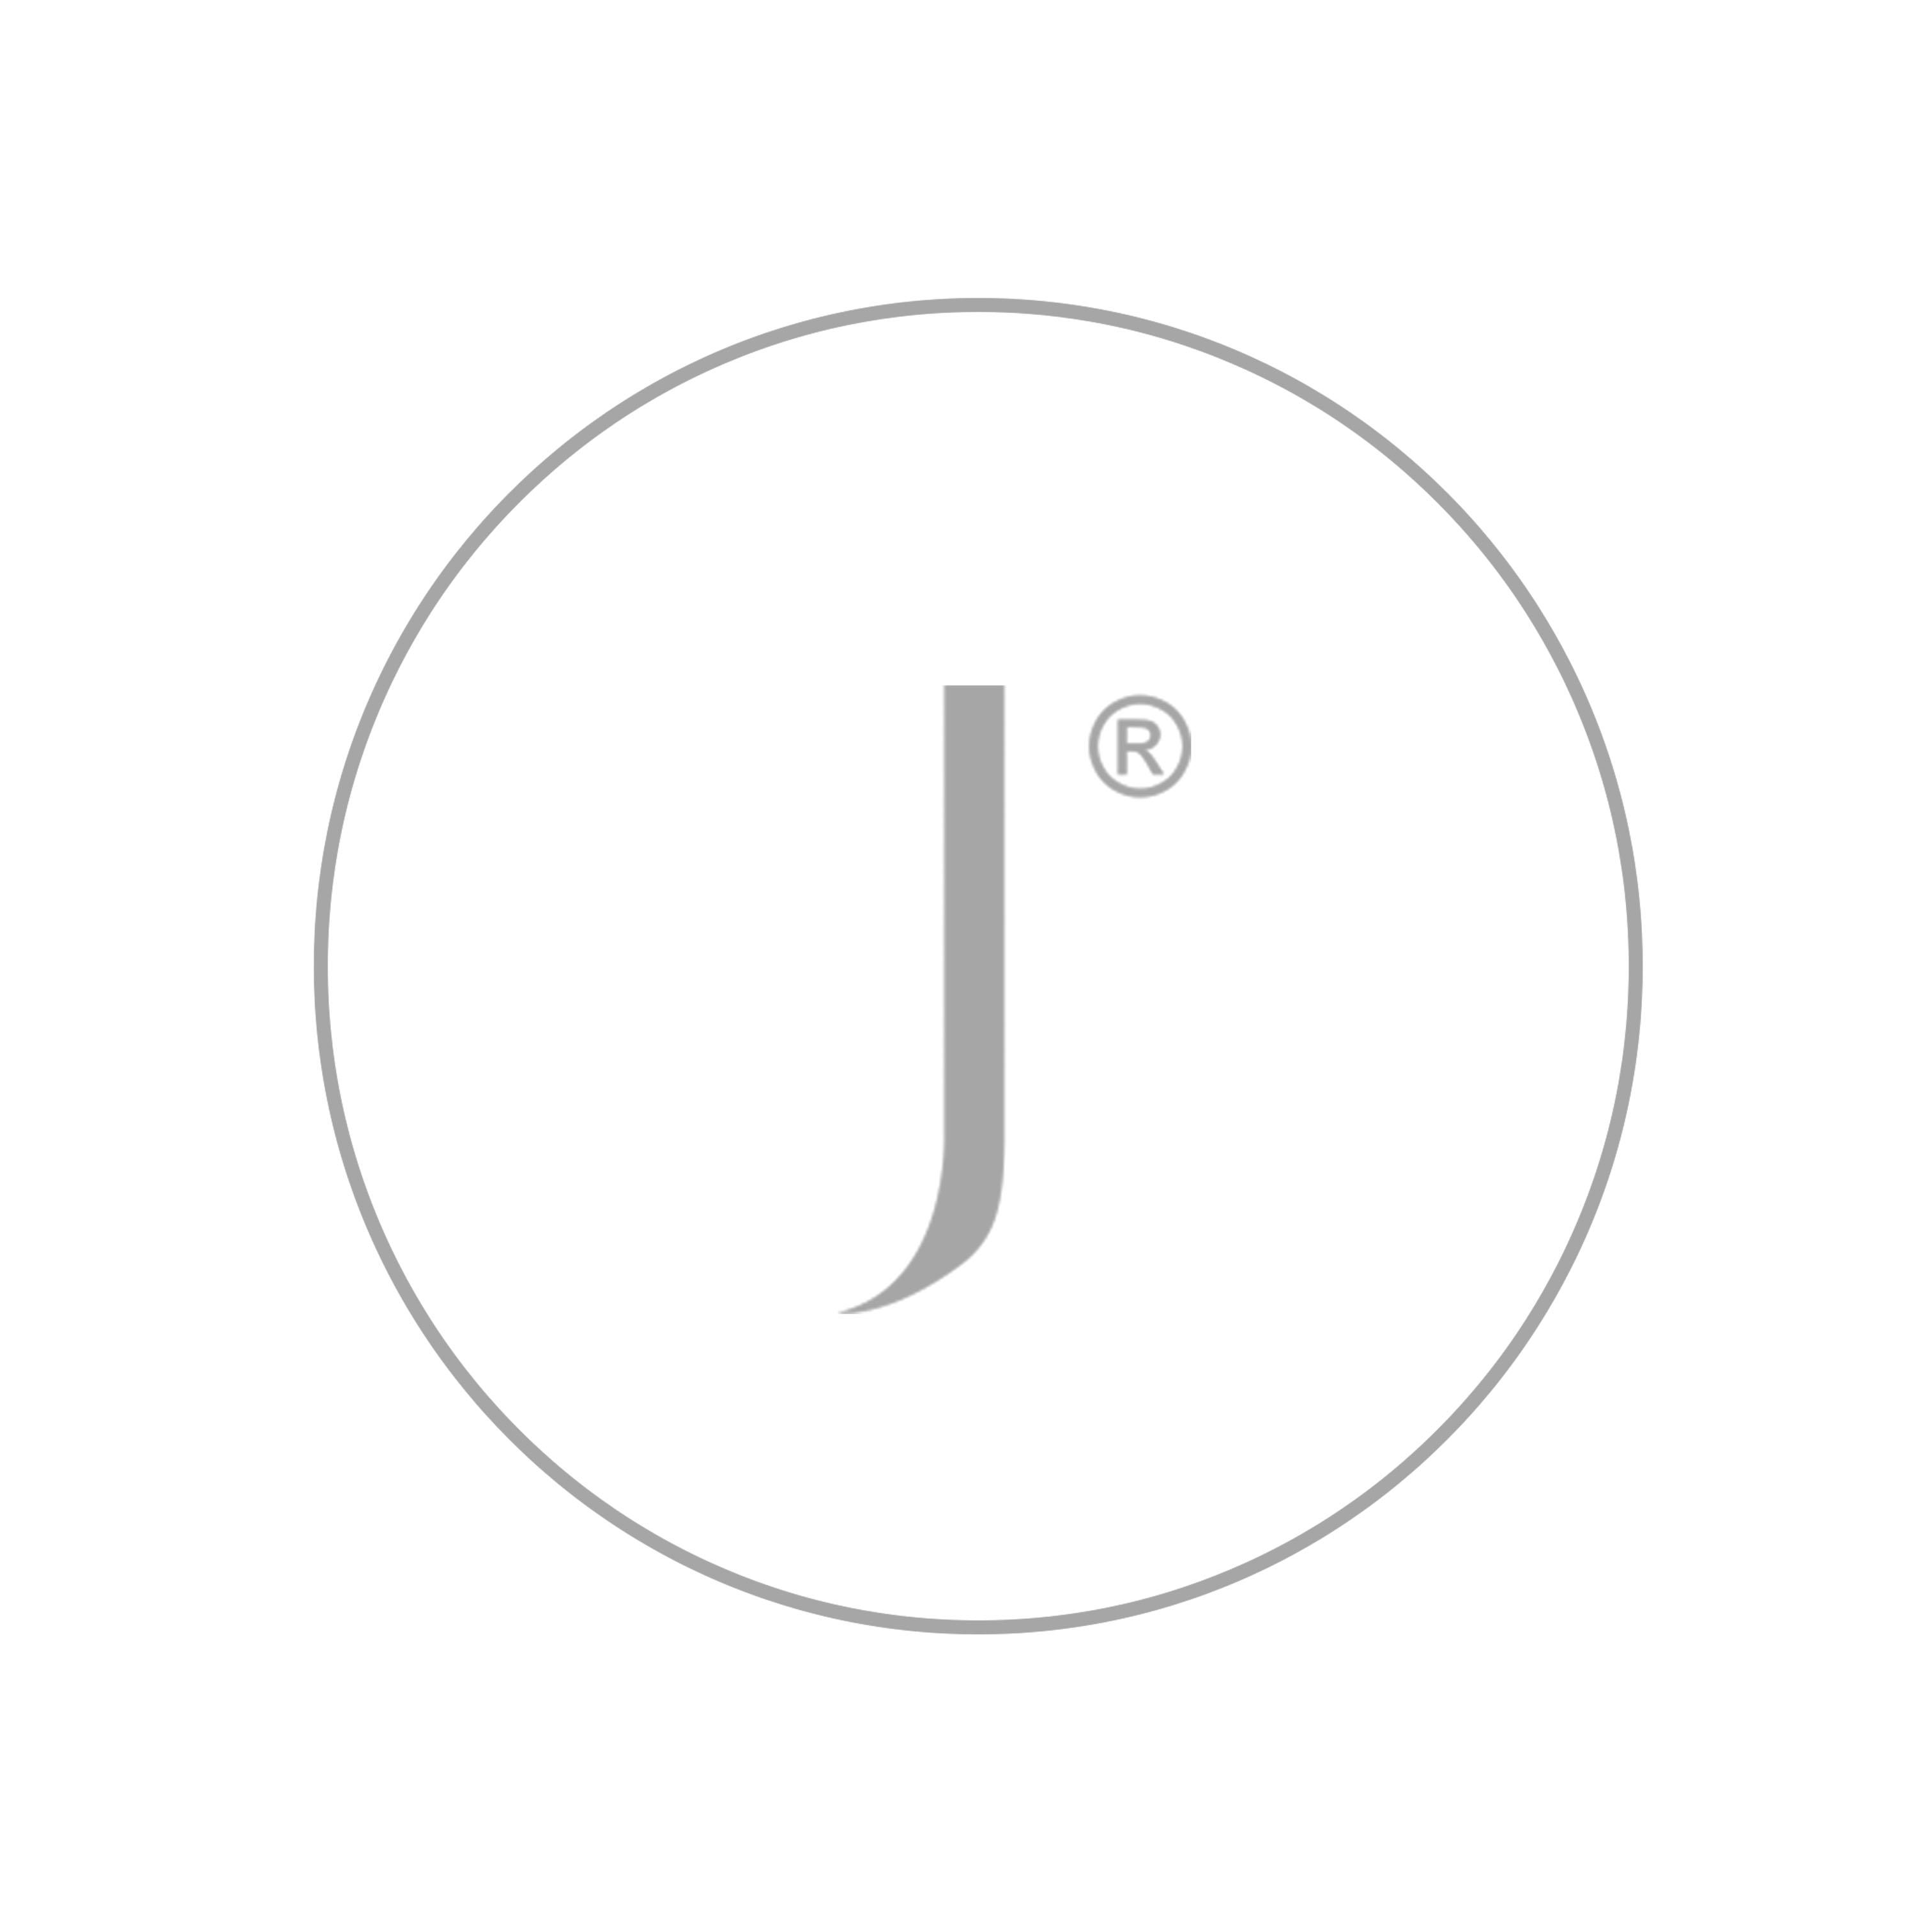 Gold Amethyst Drop Earrings - February Birthstone